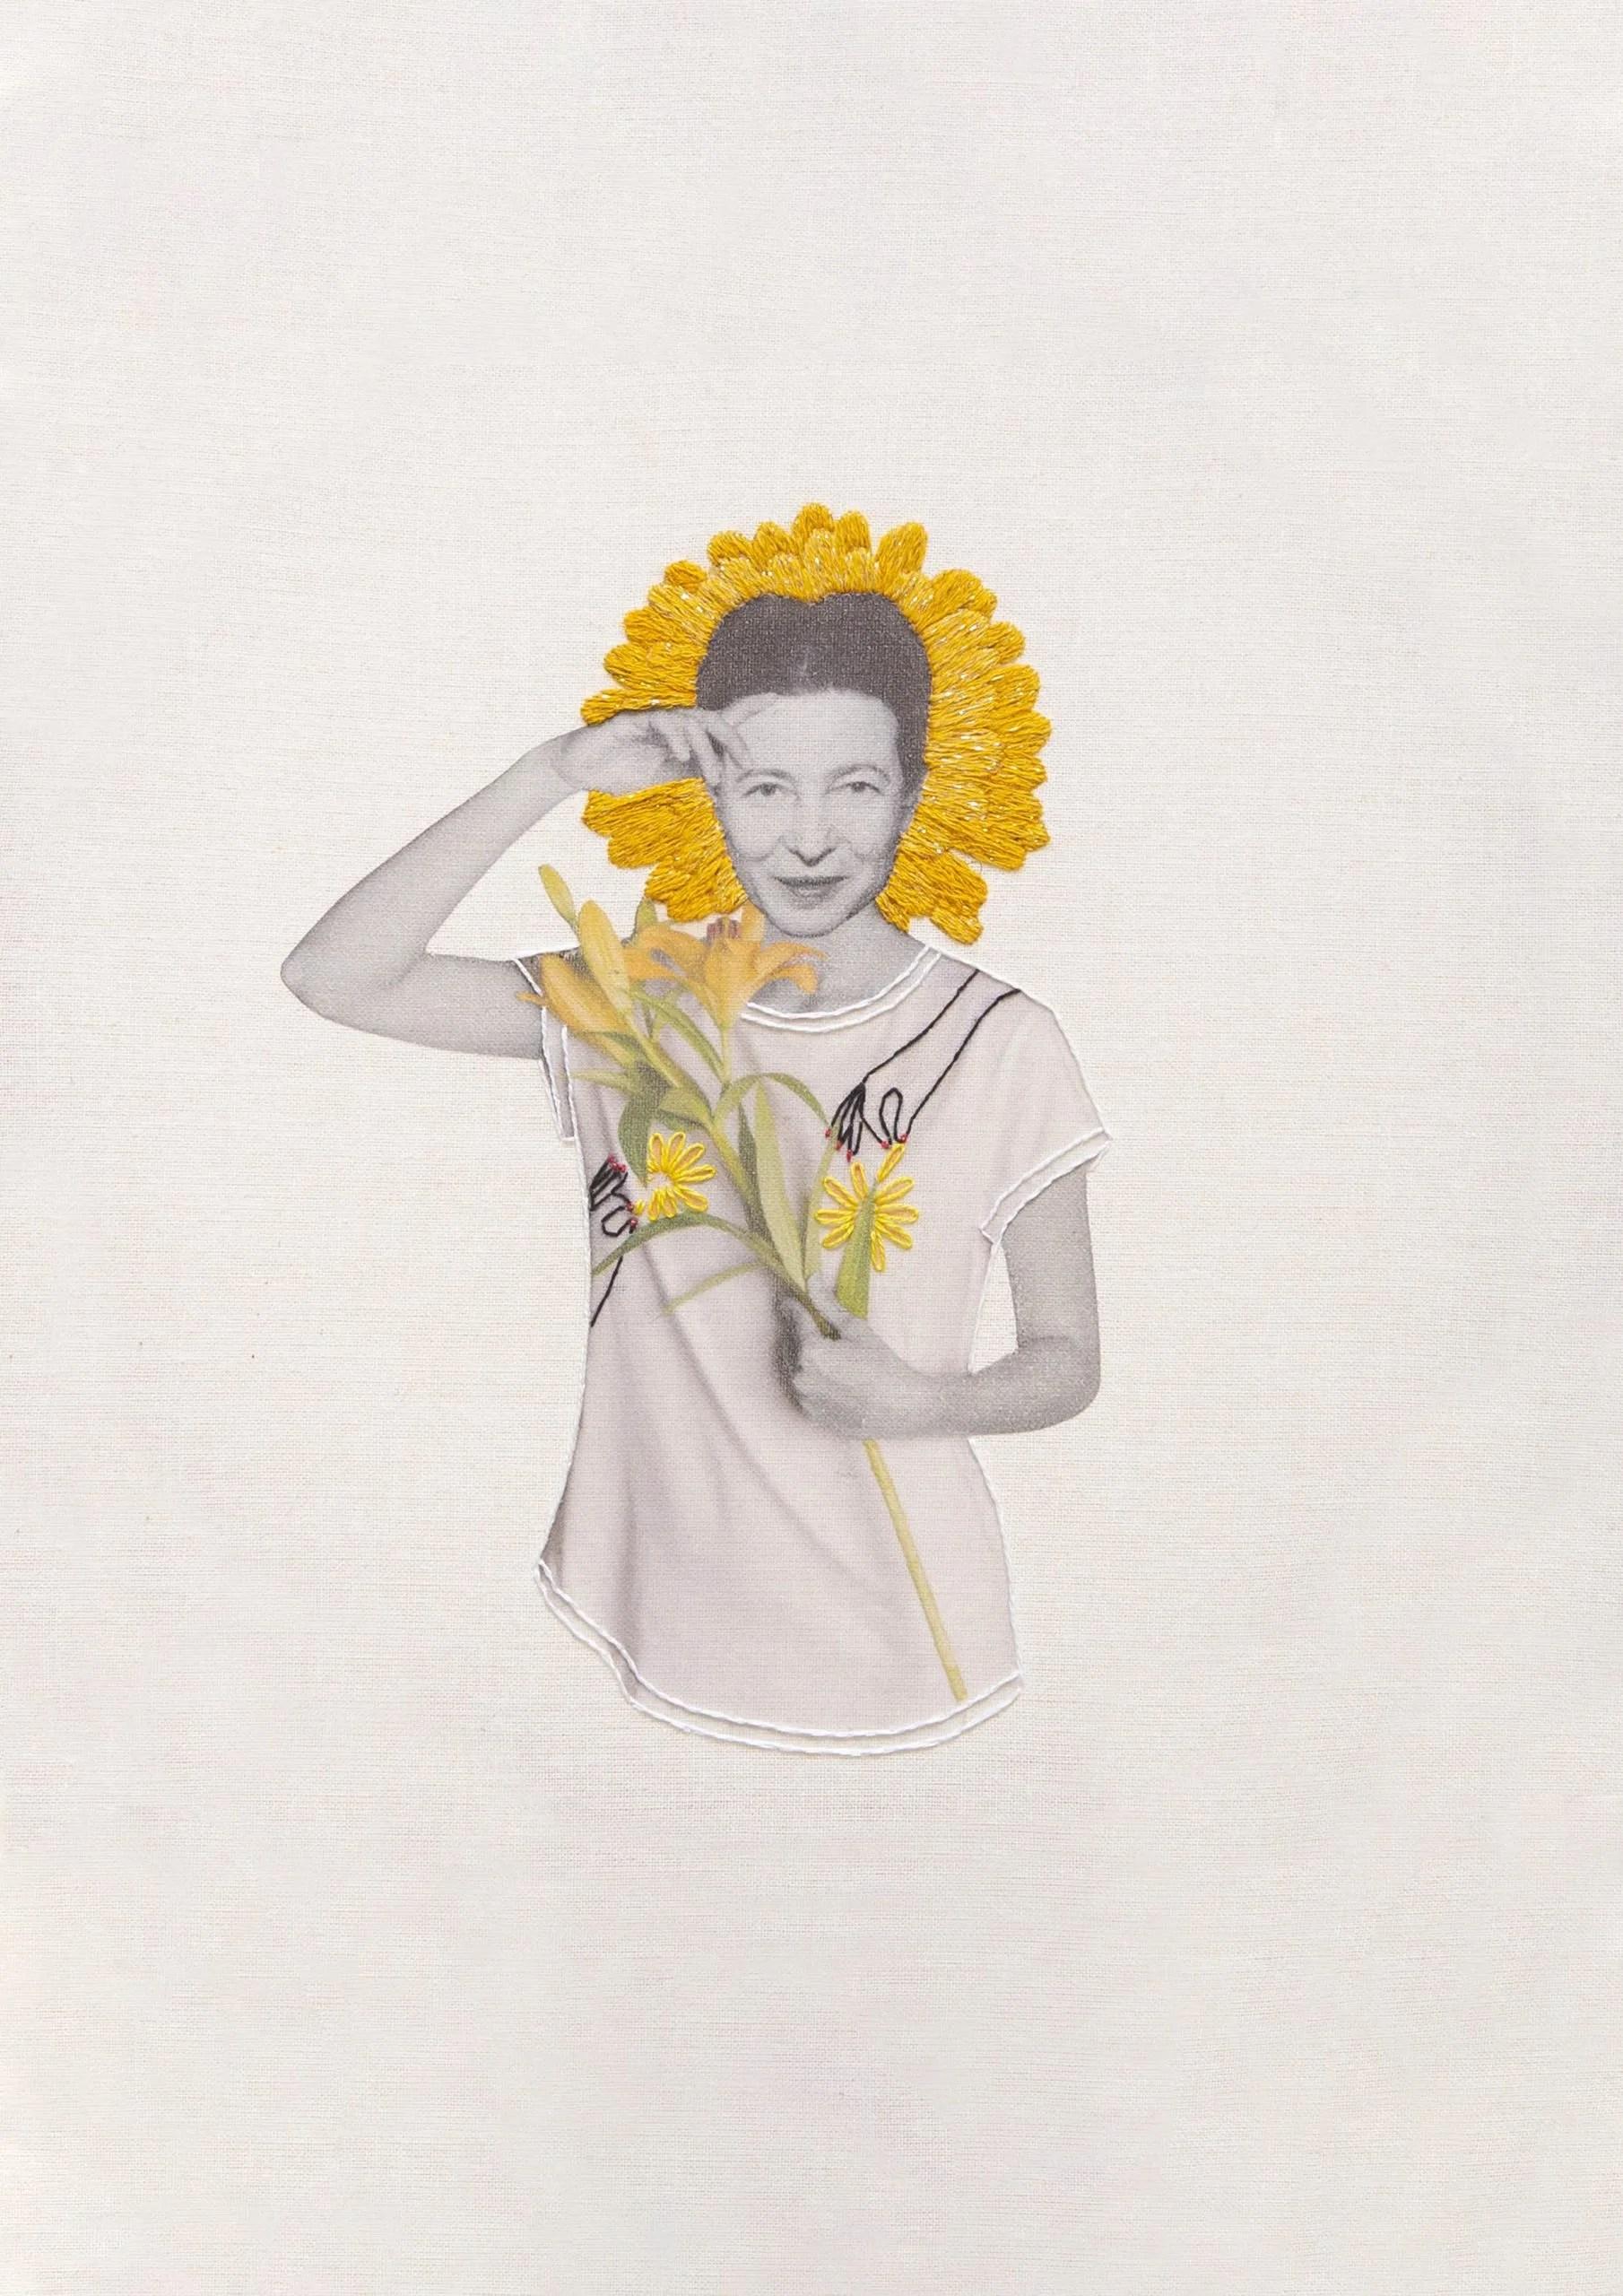 Simone de Beauvoir Collage Studio Variopinto Crisálida2